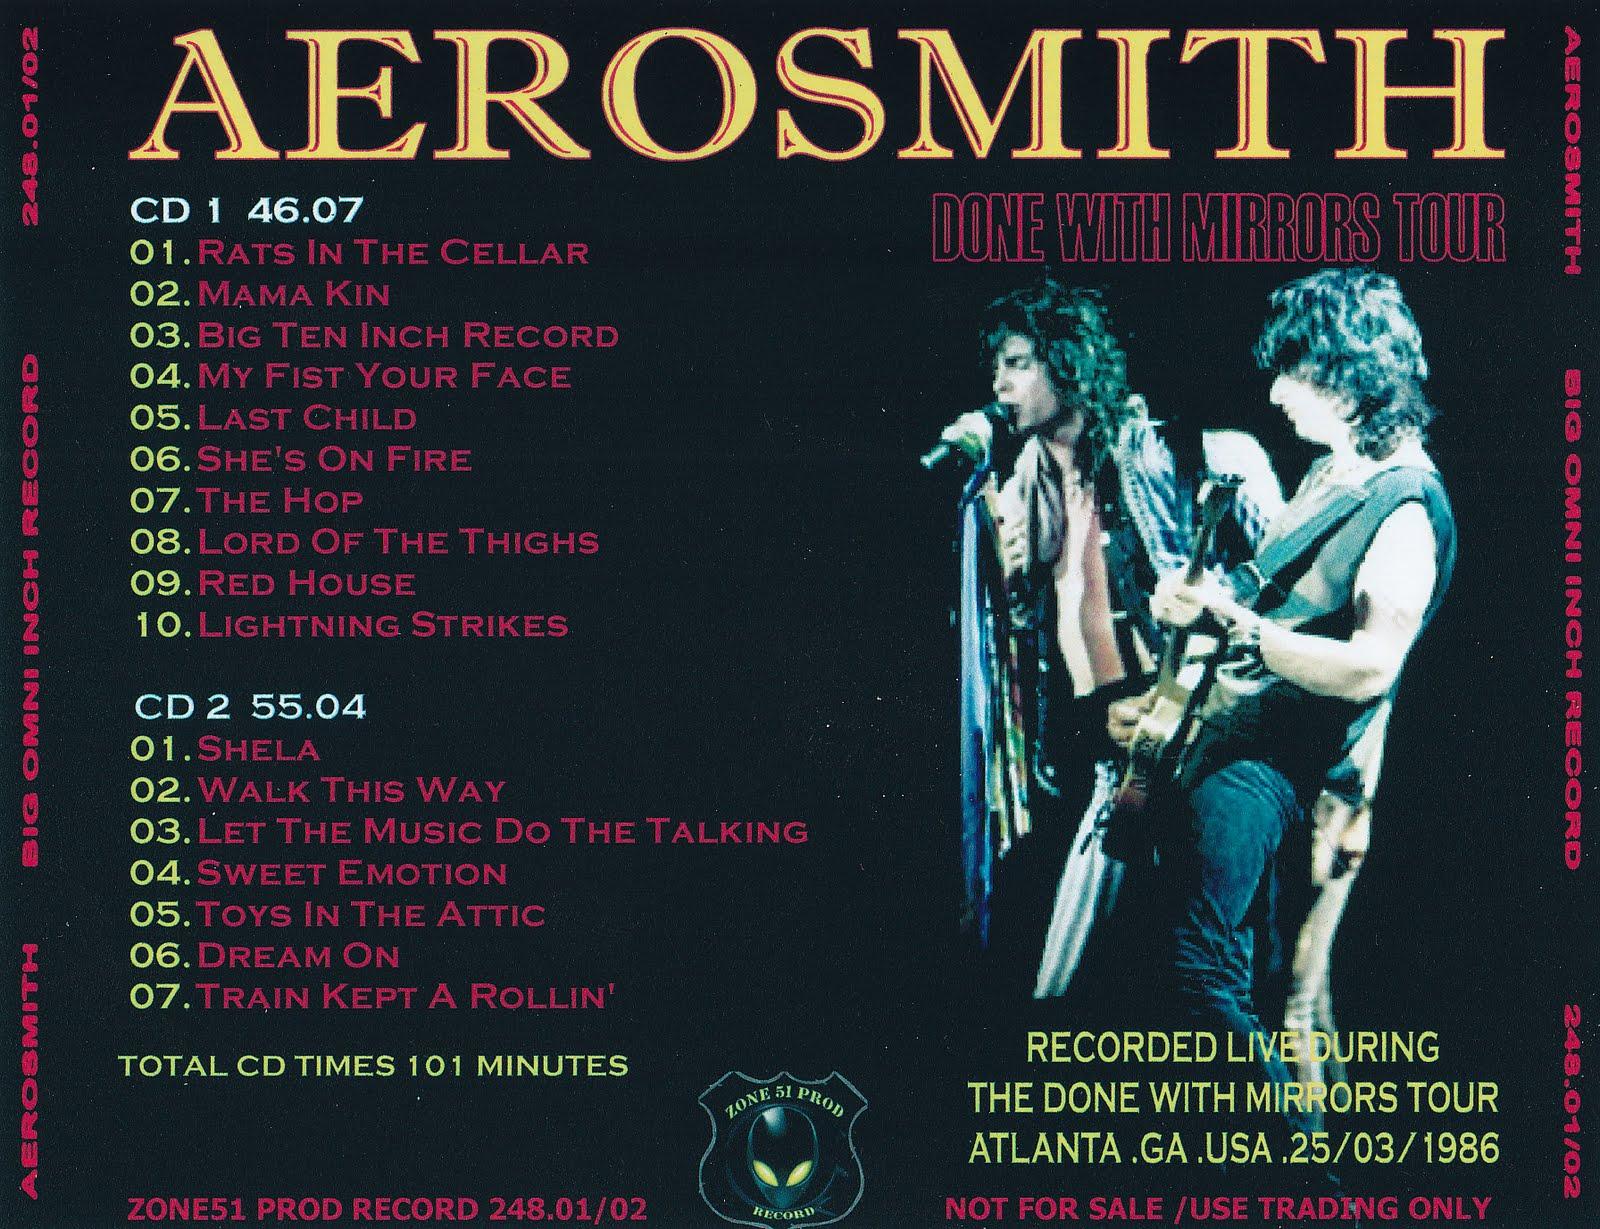 Aerosmith Bootlegs Cover Arts Big Omni Inch Record